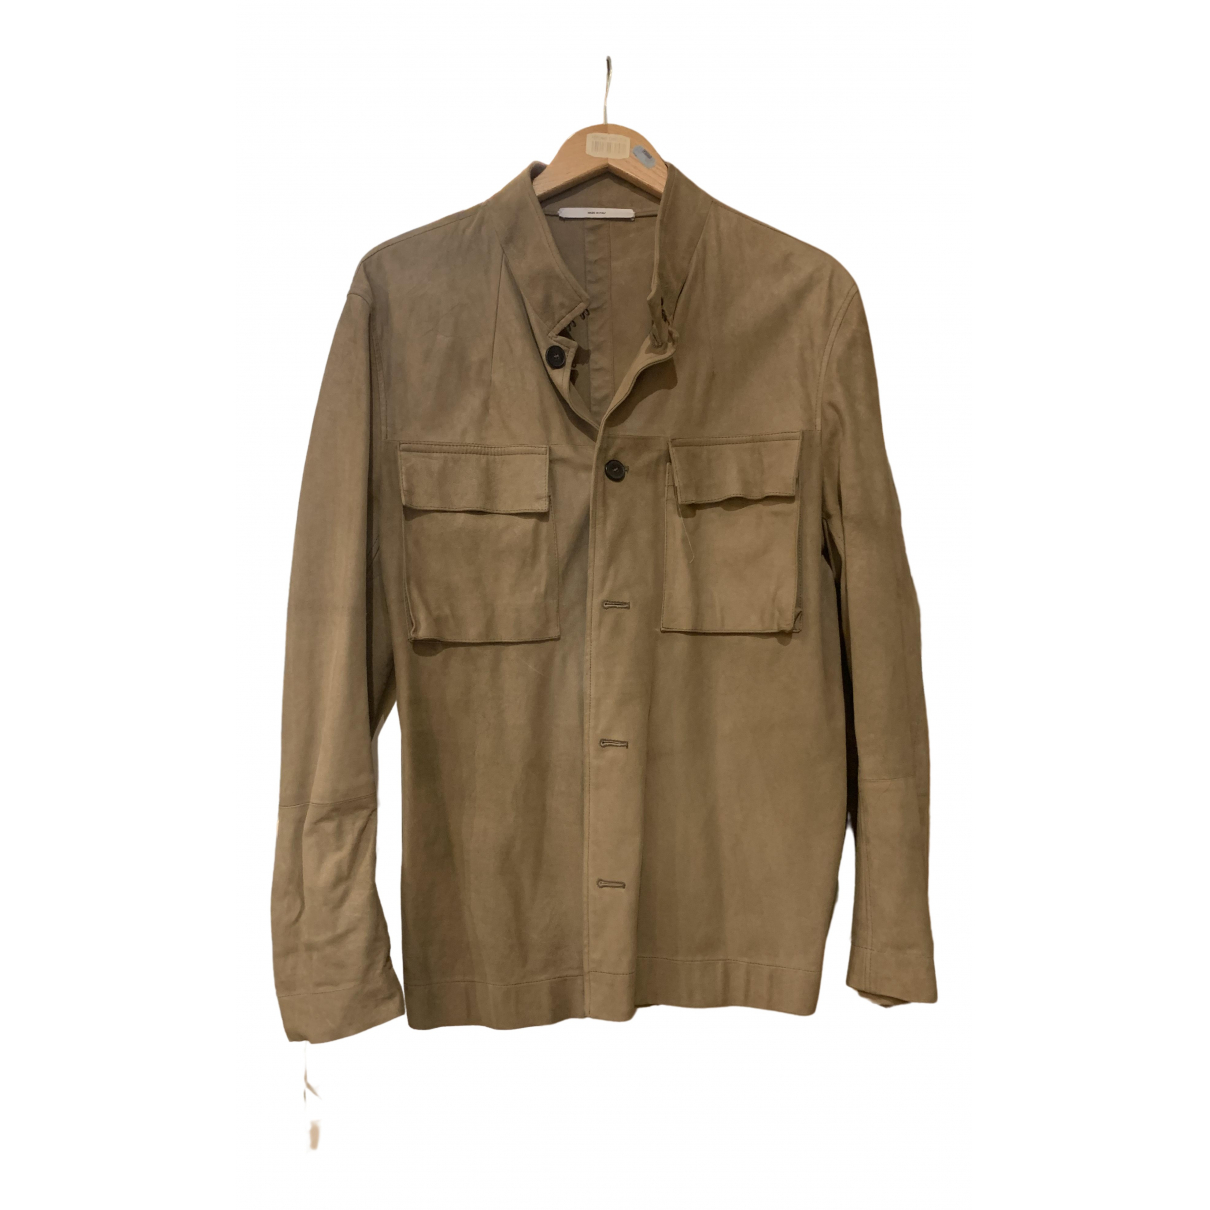 Yves Saint Laurent \N Beige Suede jacket  for Men 50 IT